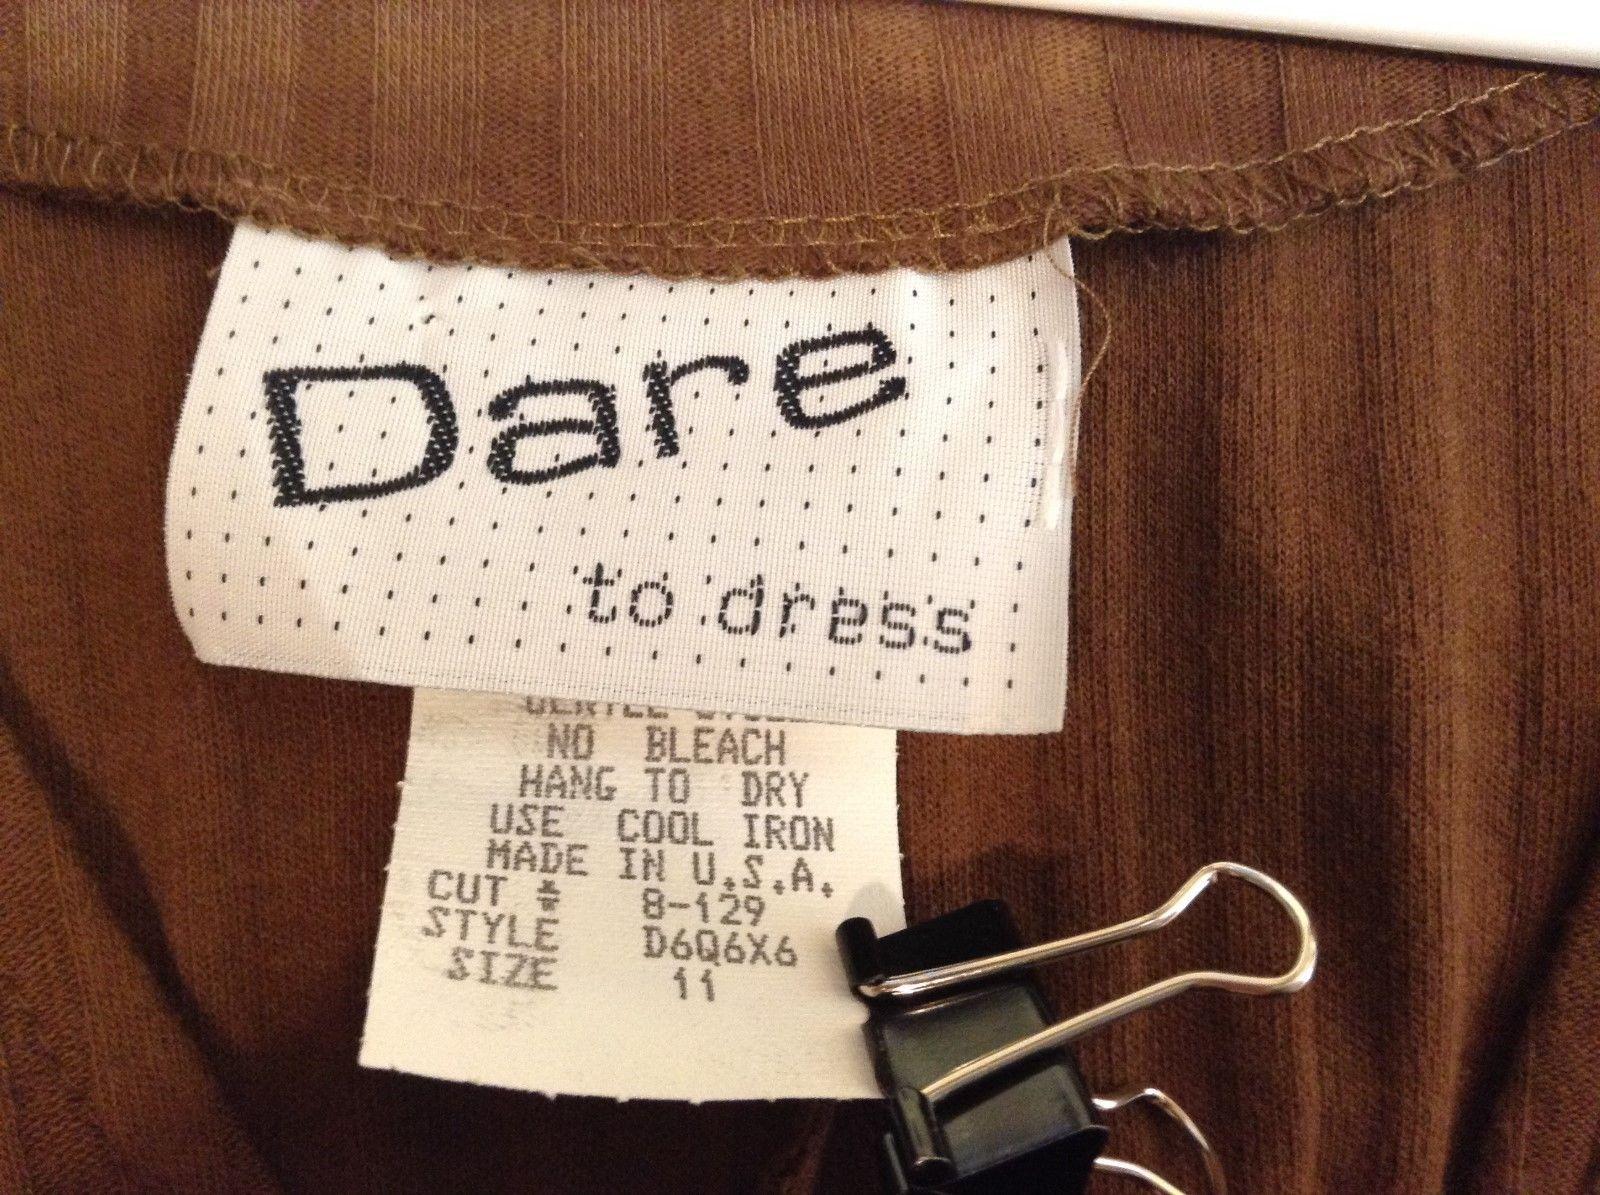 Dare To Dress Long Brown Sleeveless Dress Sz 11